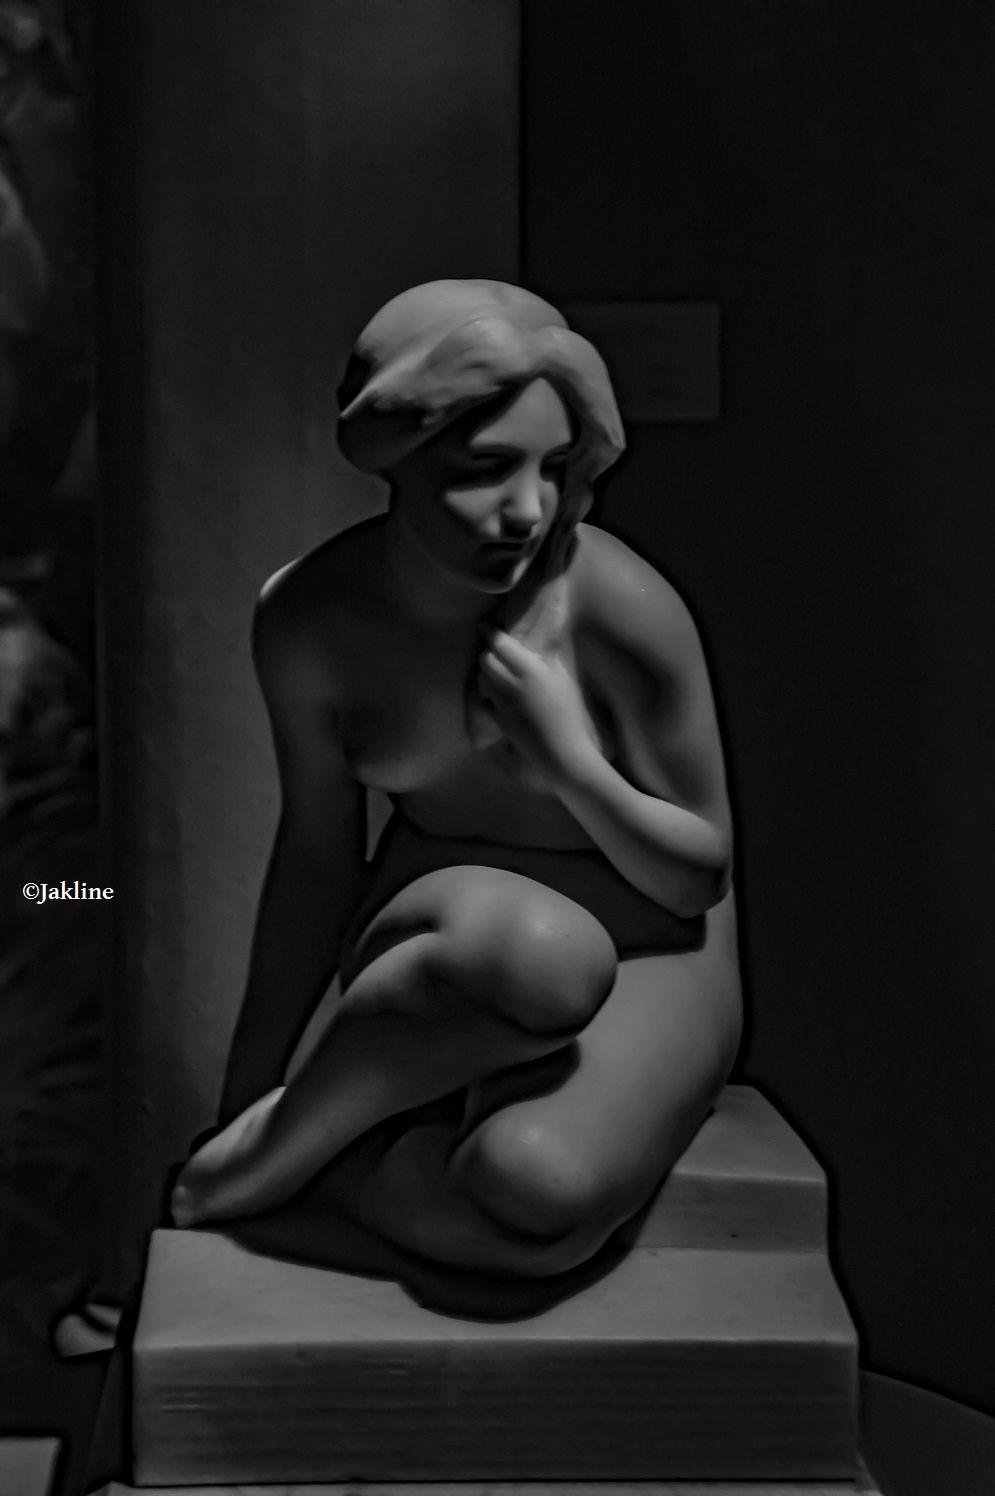 Maternità et Modestia